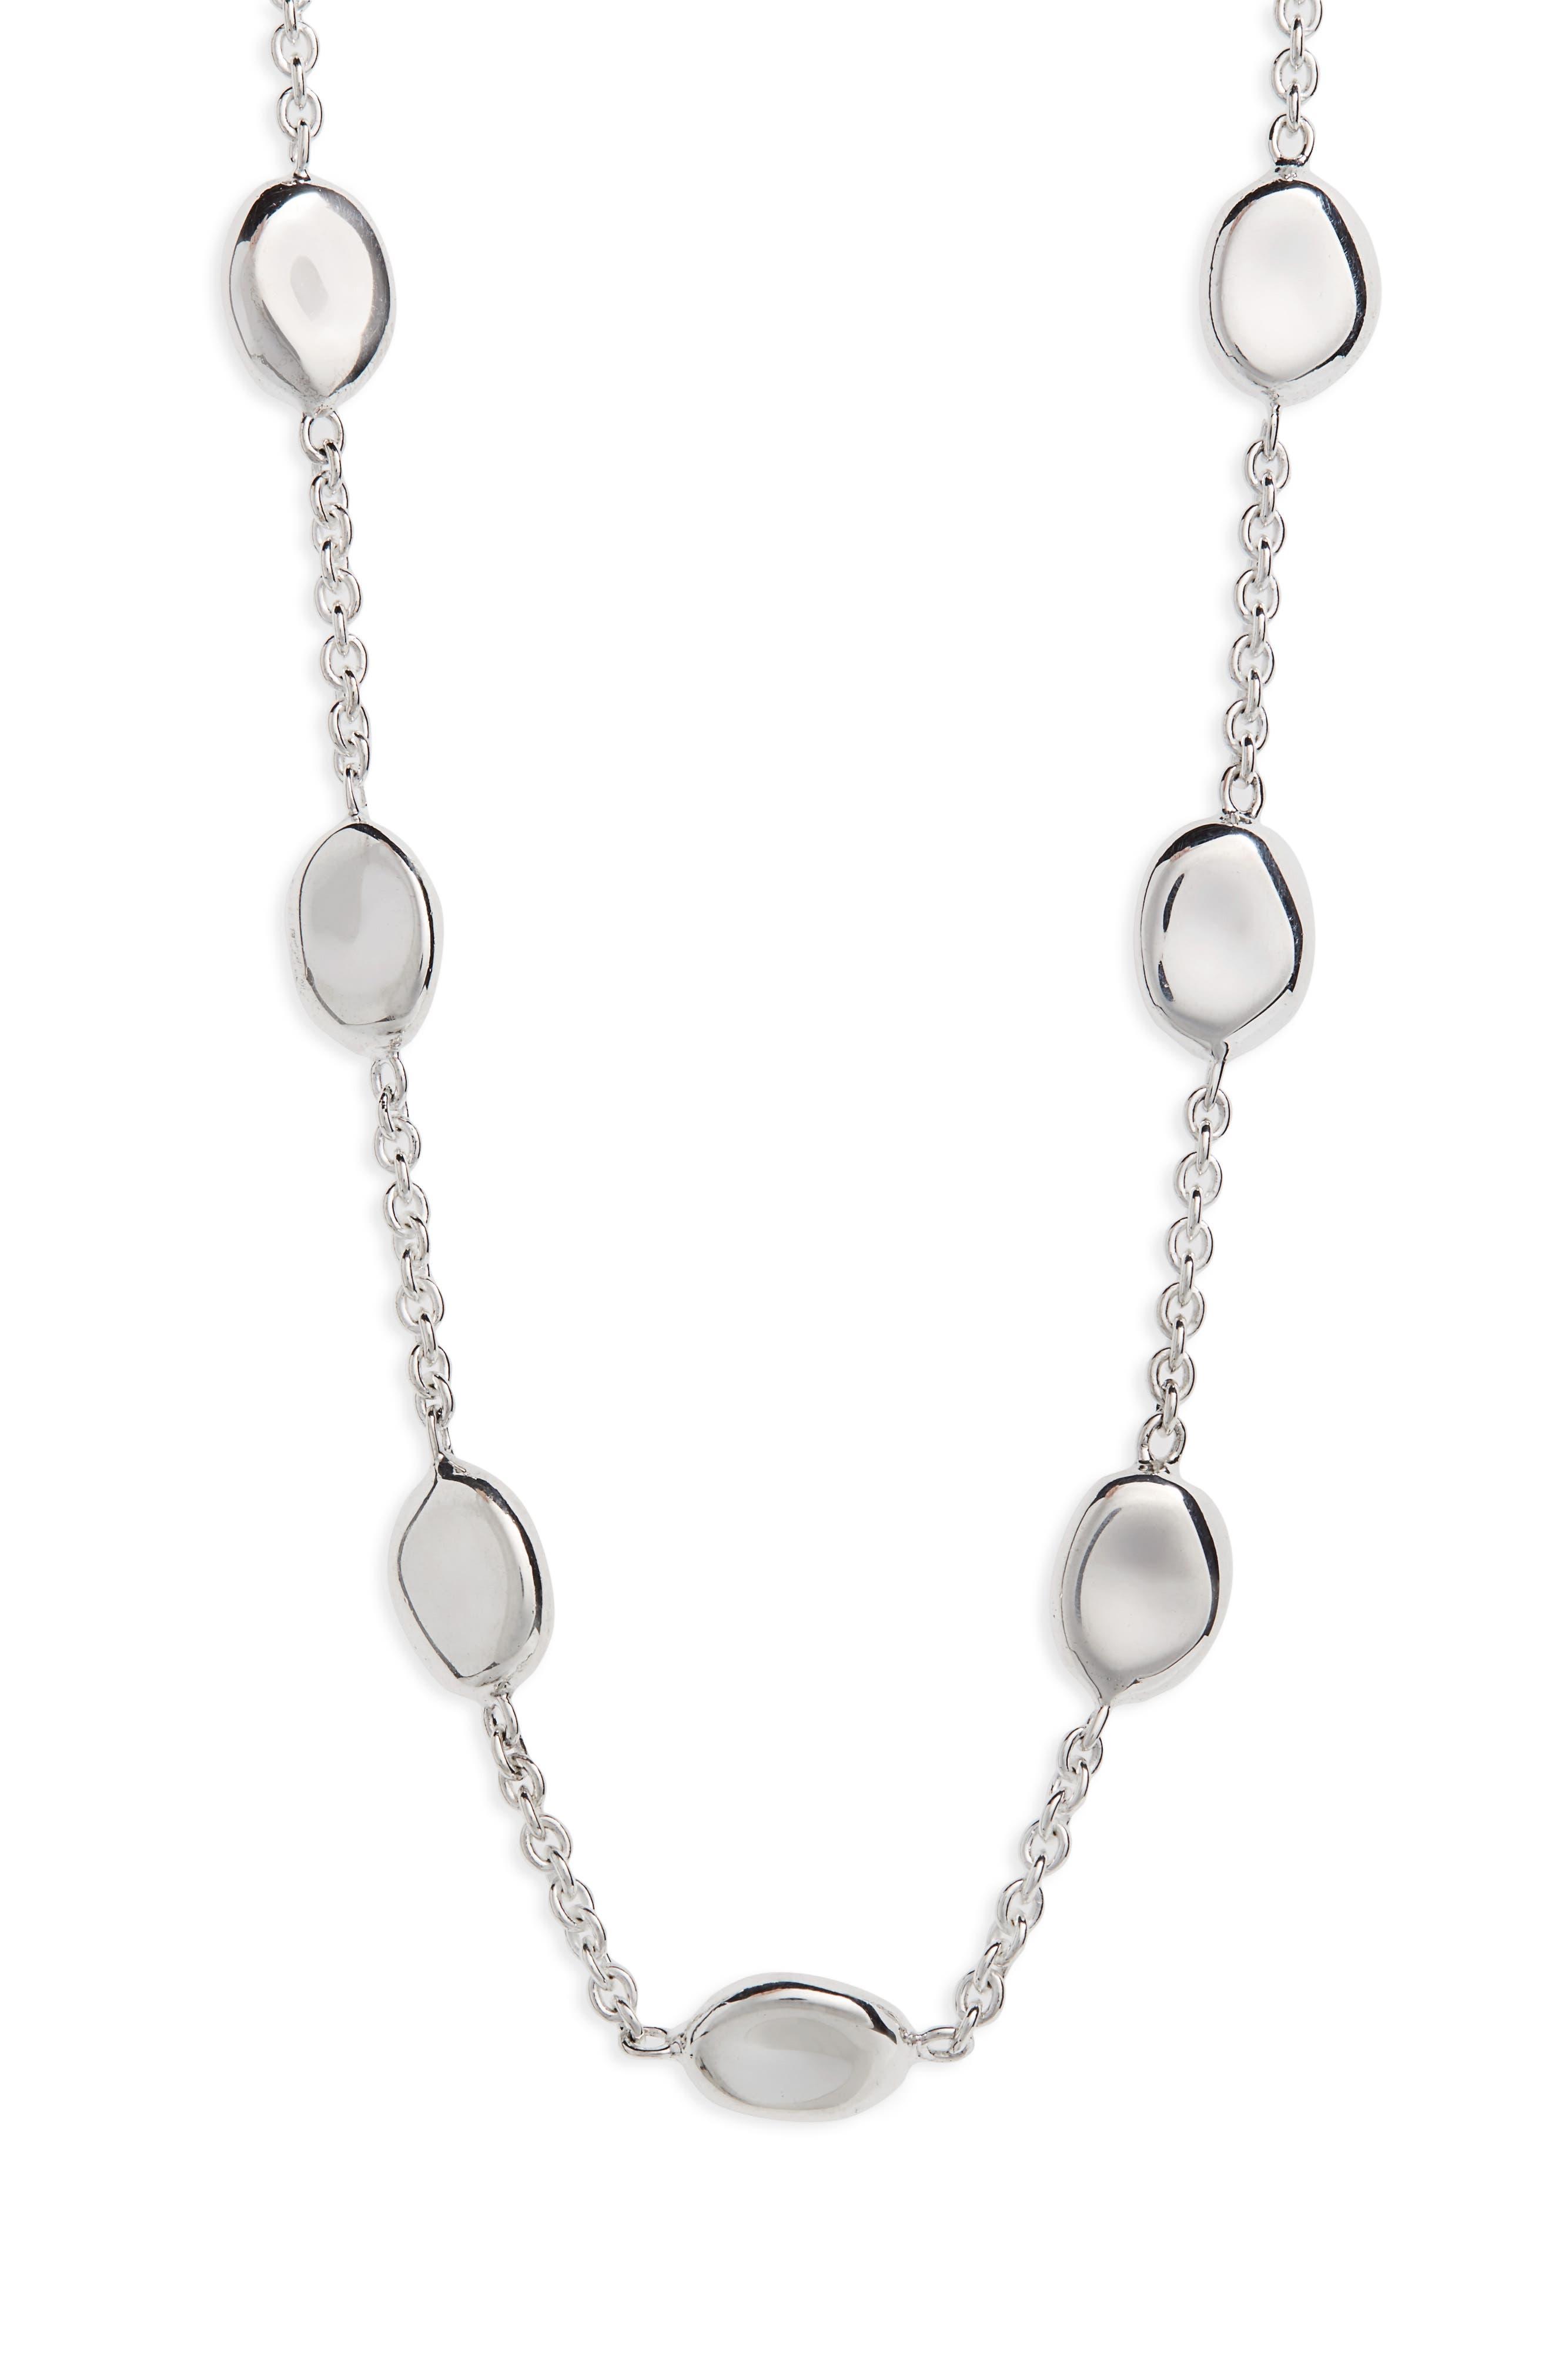 Main Image - Ippolita Onda Chain Necklace